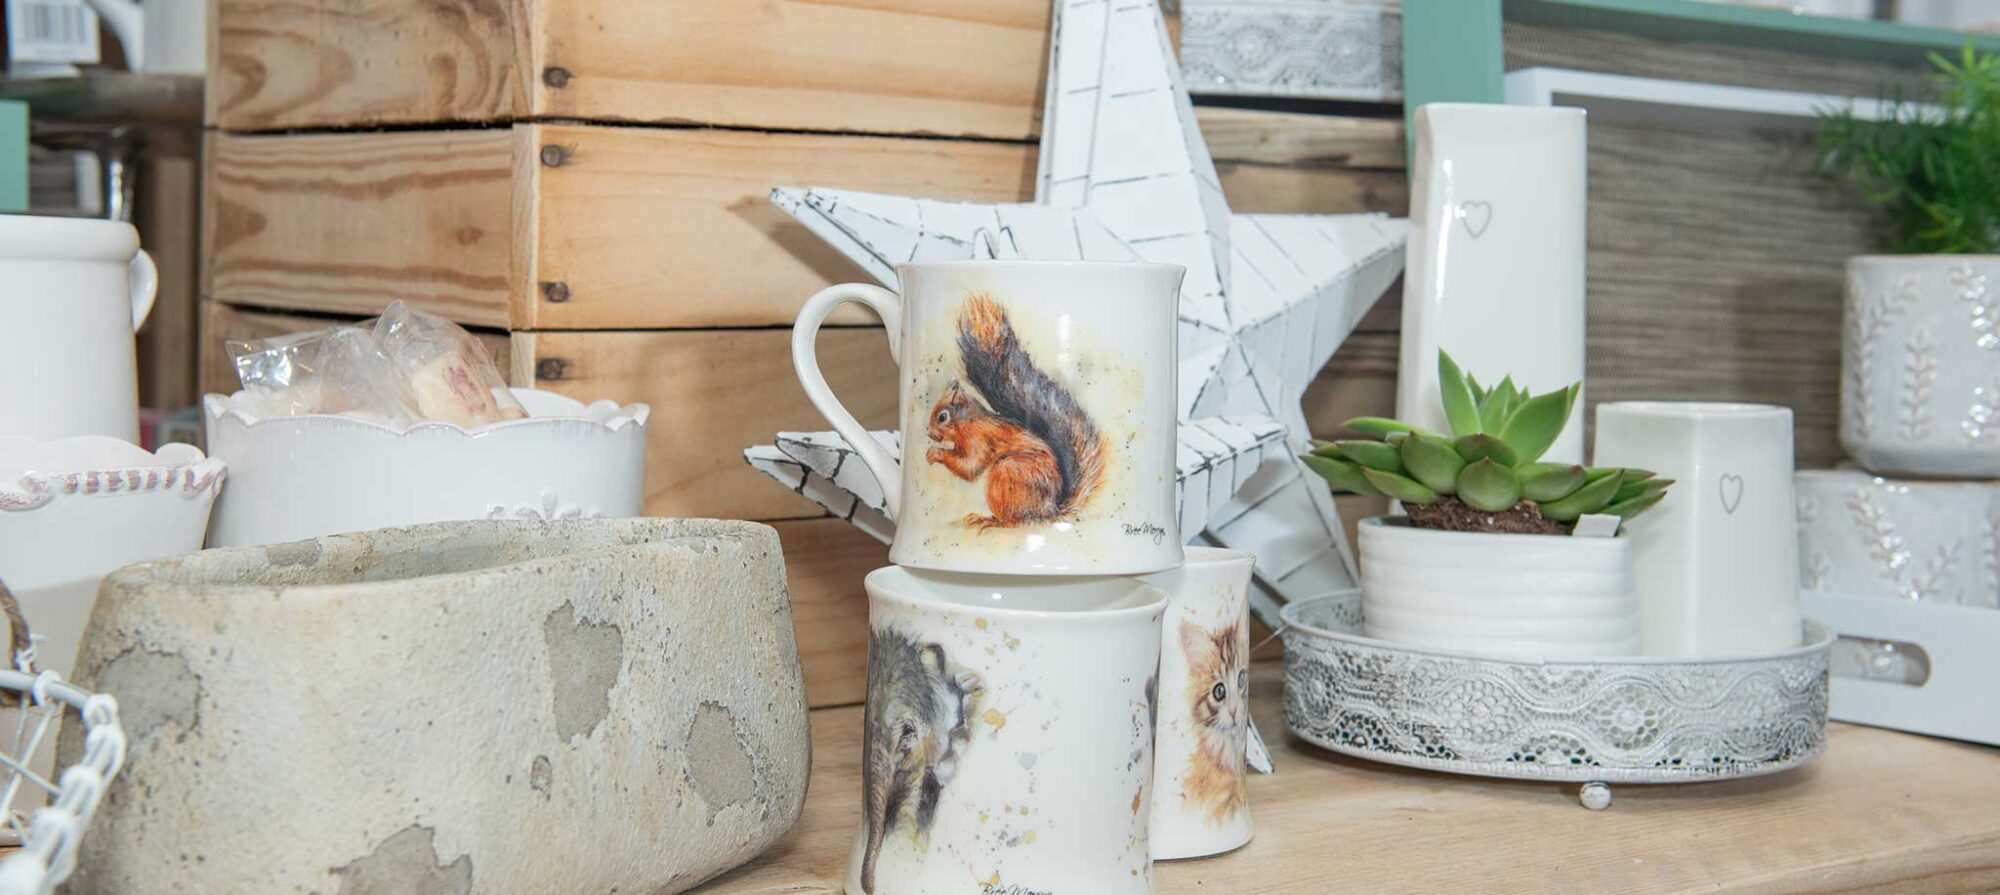 Ceramics at P&K Home Interiors